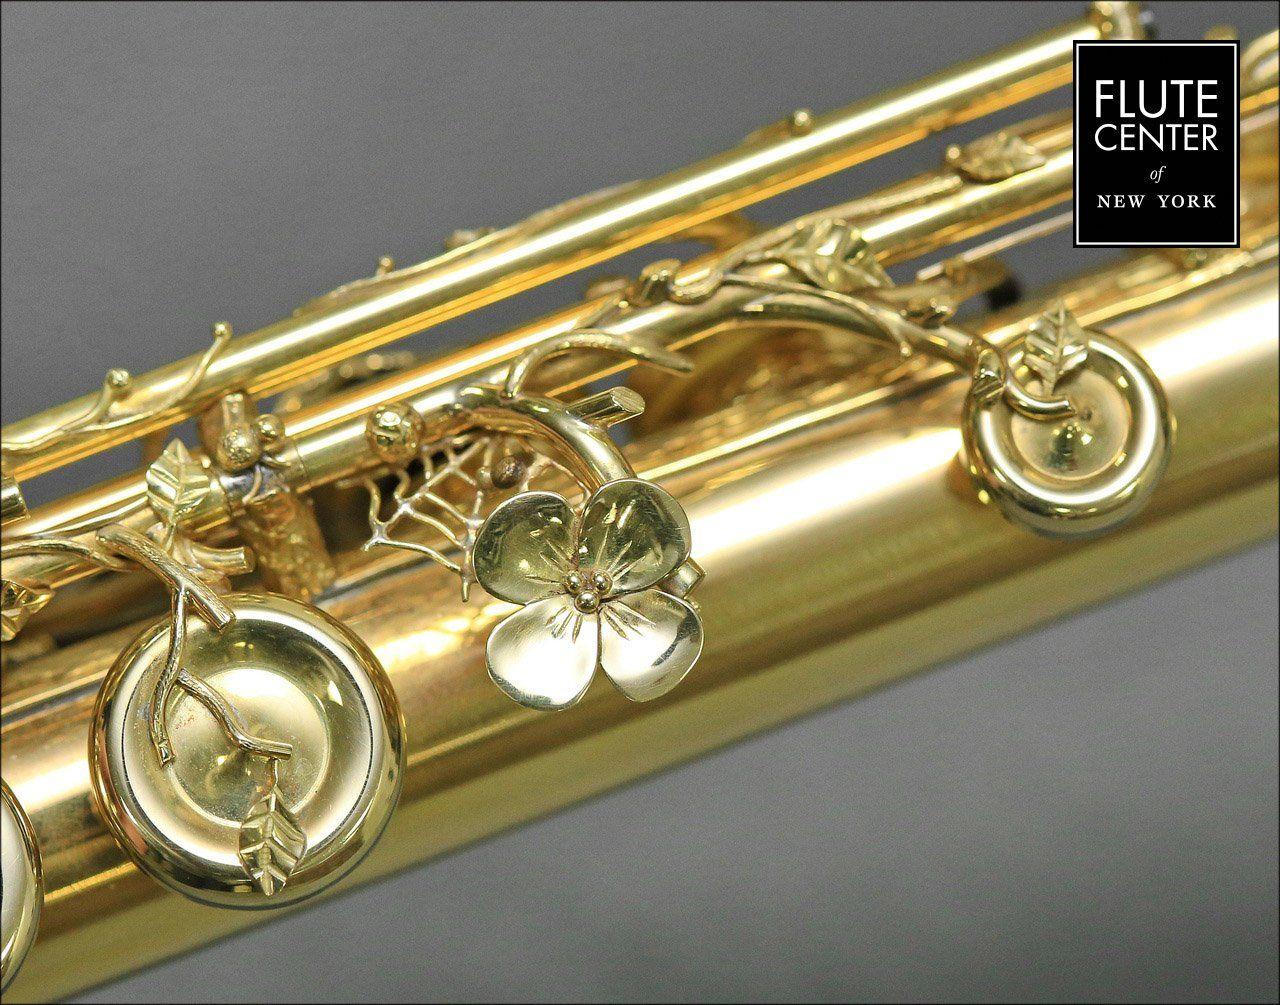 Lunn Green Gold Flute, expensive flutes, best flutes